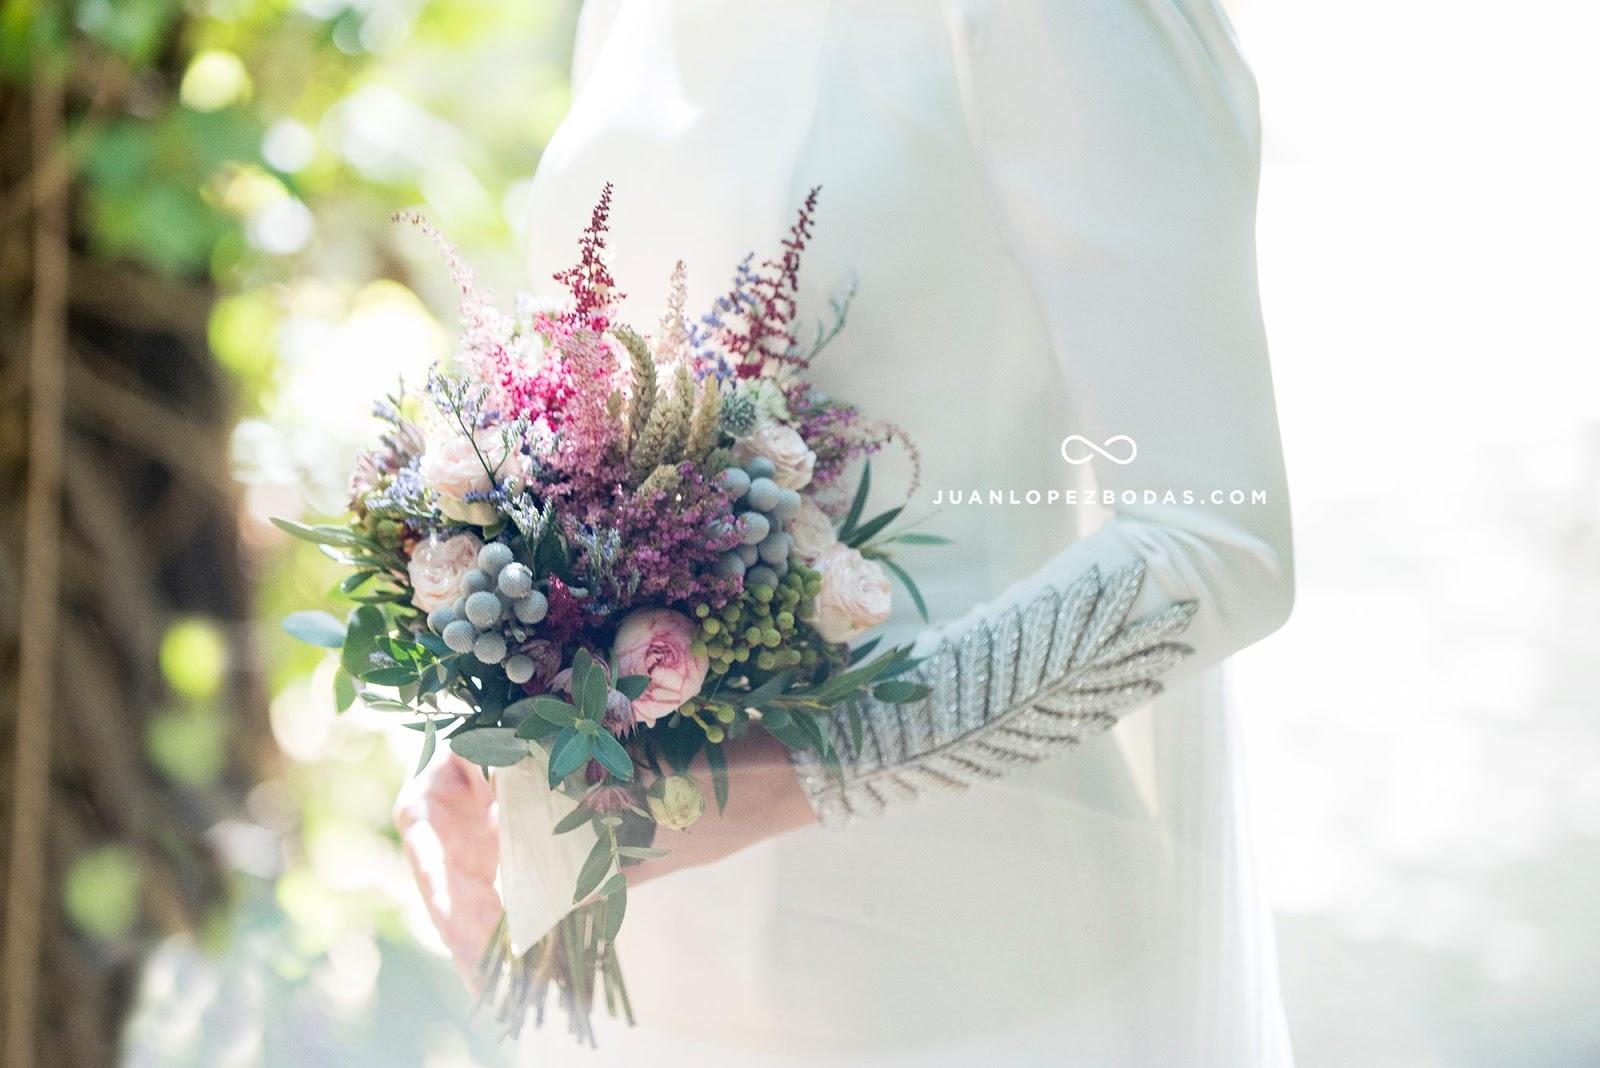 Tendencias para bodas 2017 ideas originales de c rtamo for Tendencias de bodas 2017